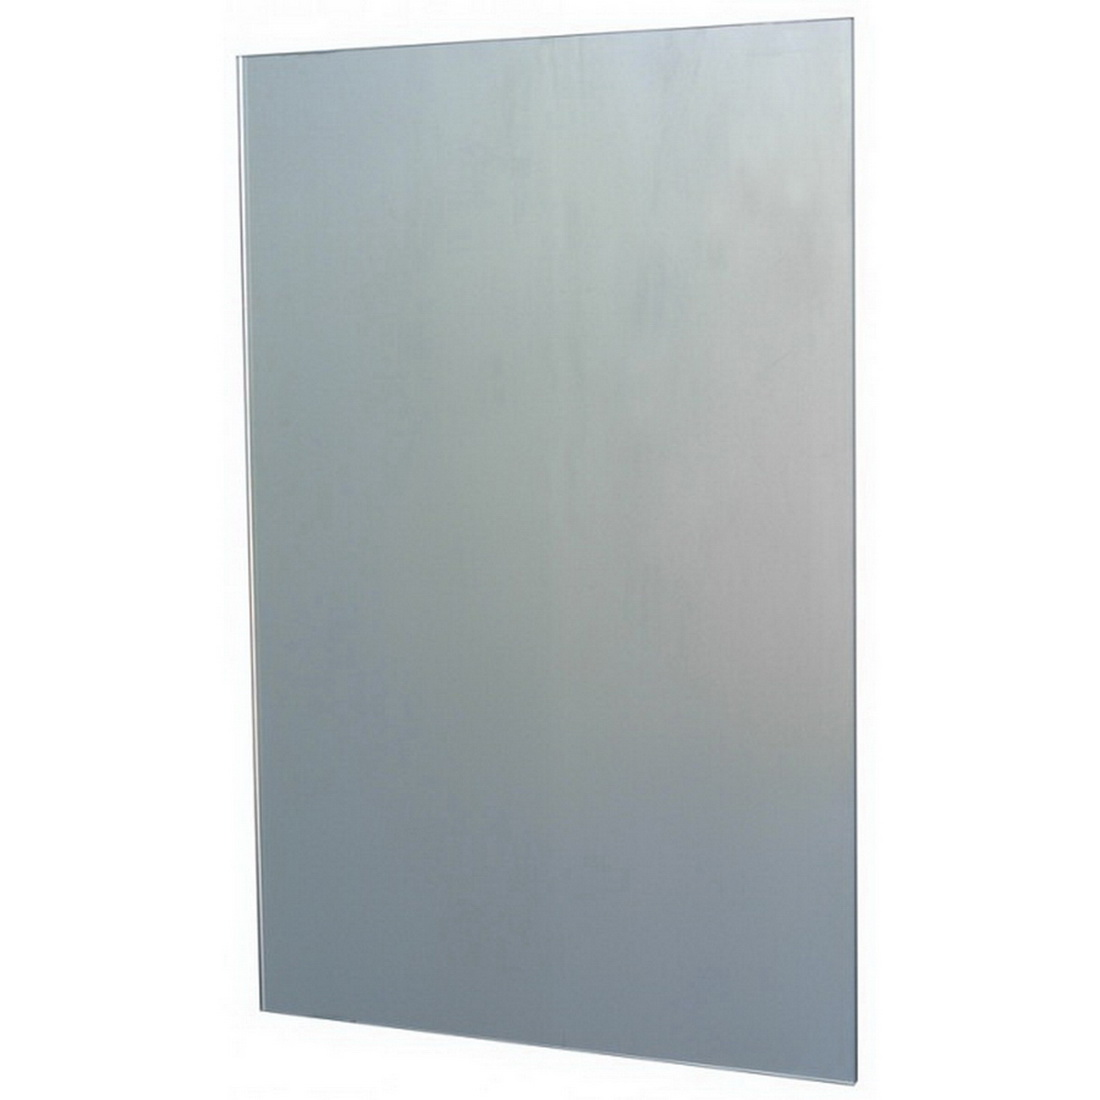 Mirrox Polished Edge Mirror 1200 x 900mm Silver 4836PEMHID